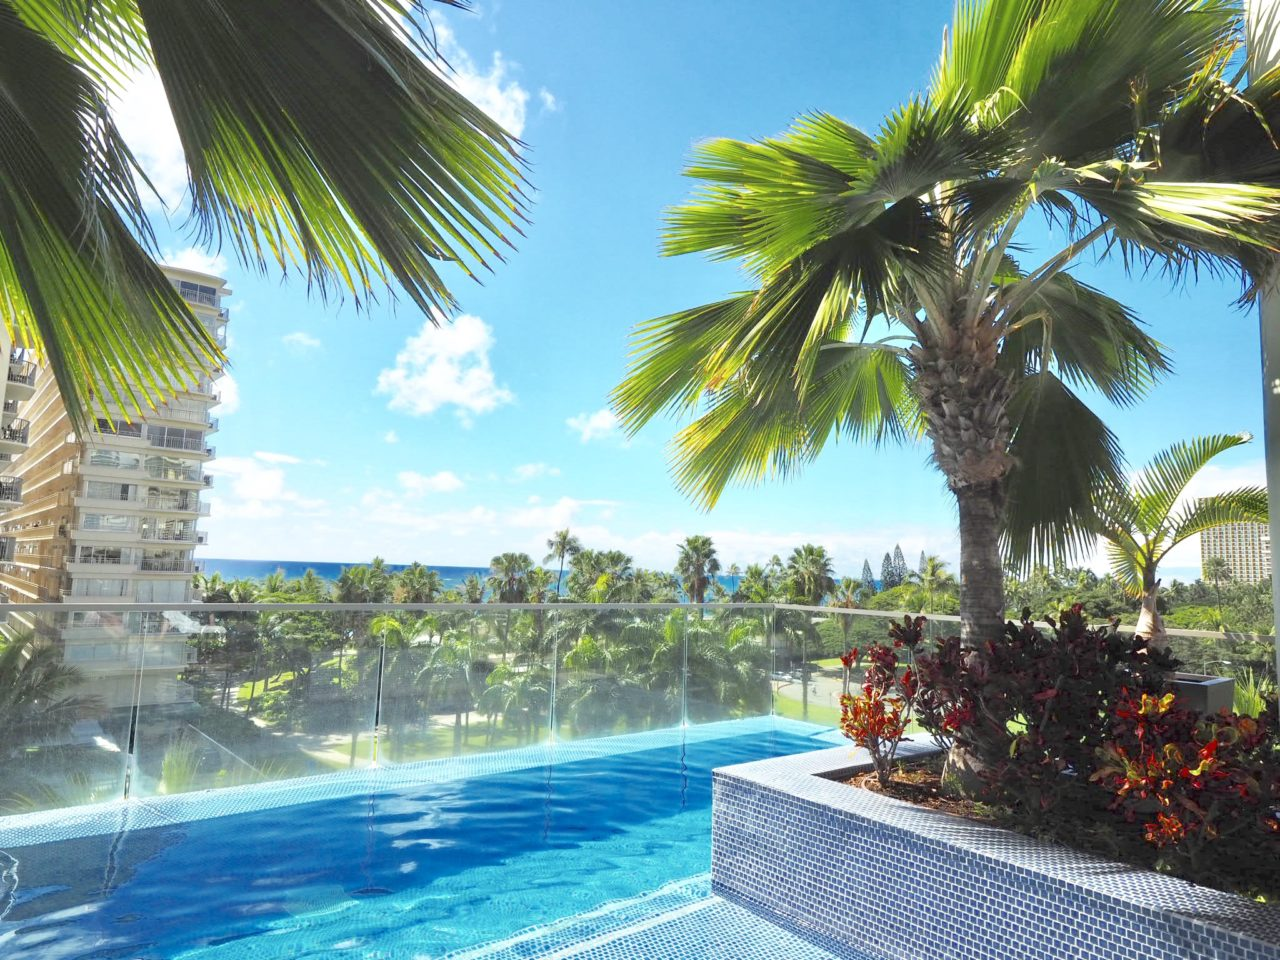 img 1471 - Trump International Hotel Waikiki - ファミリーステイに大満足!トランプ インターナショナル ホテルステイ